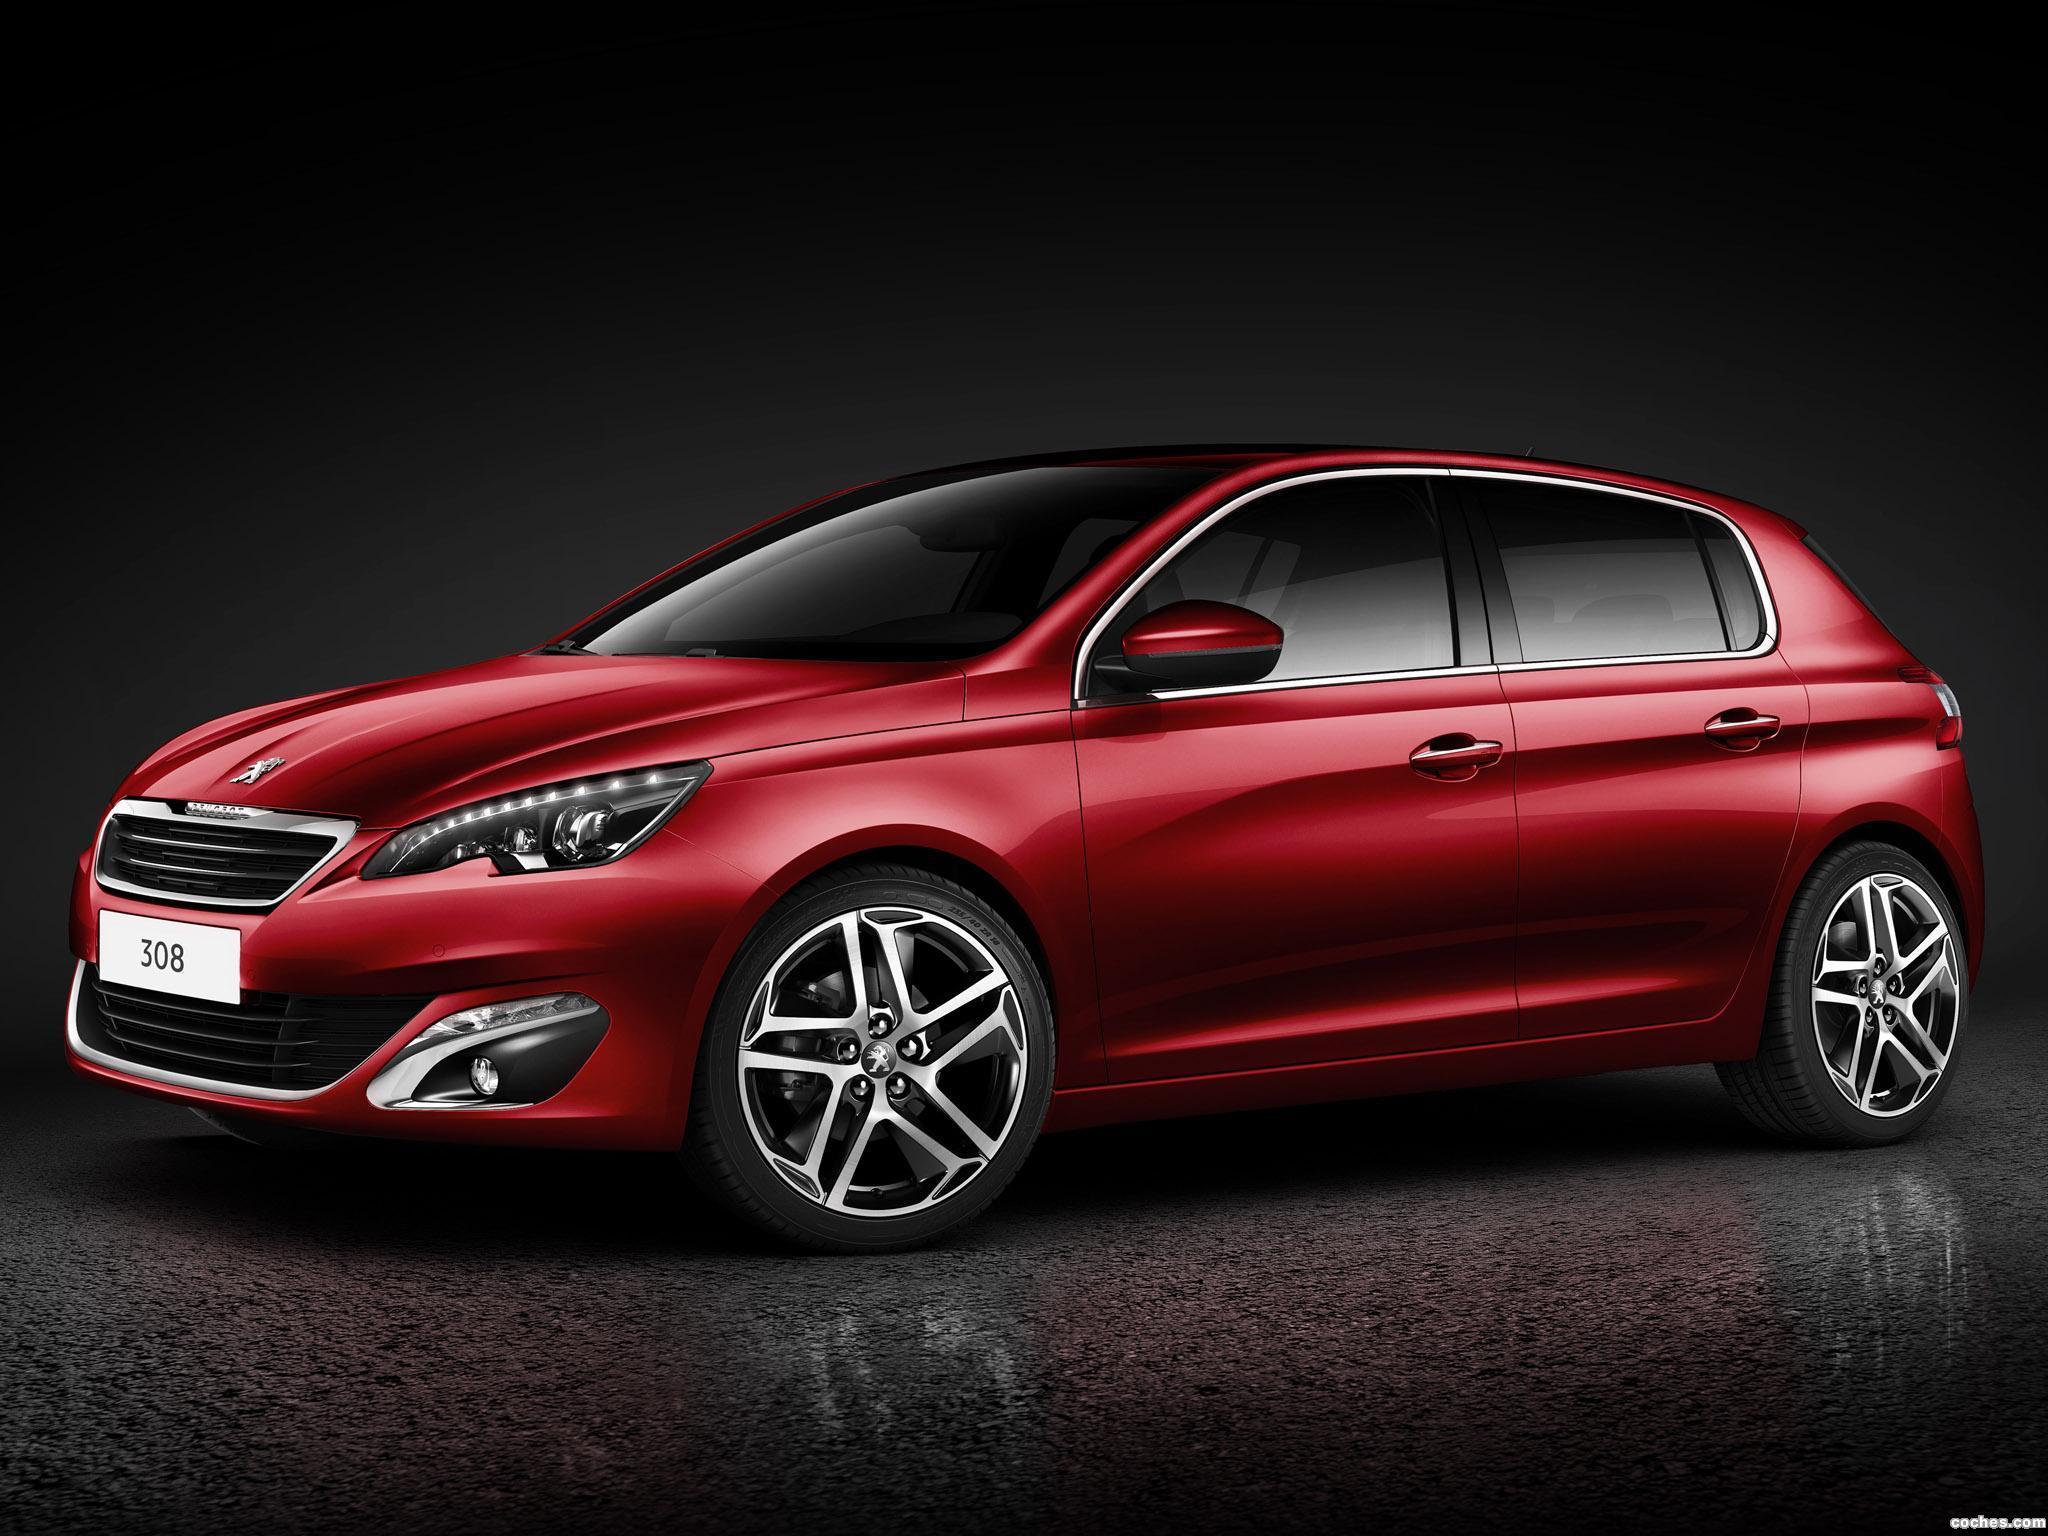 Foto 0 de Peugeot 308 5 puertas 2013